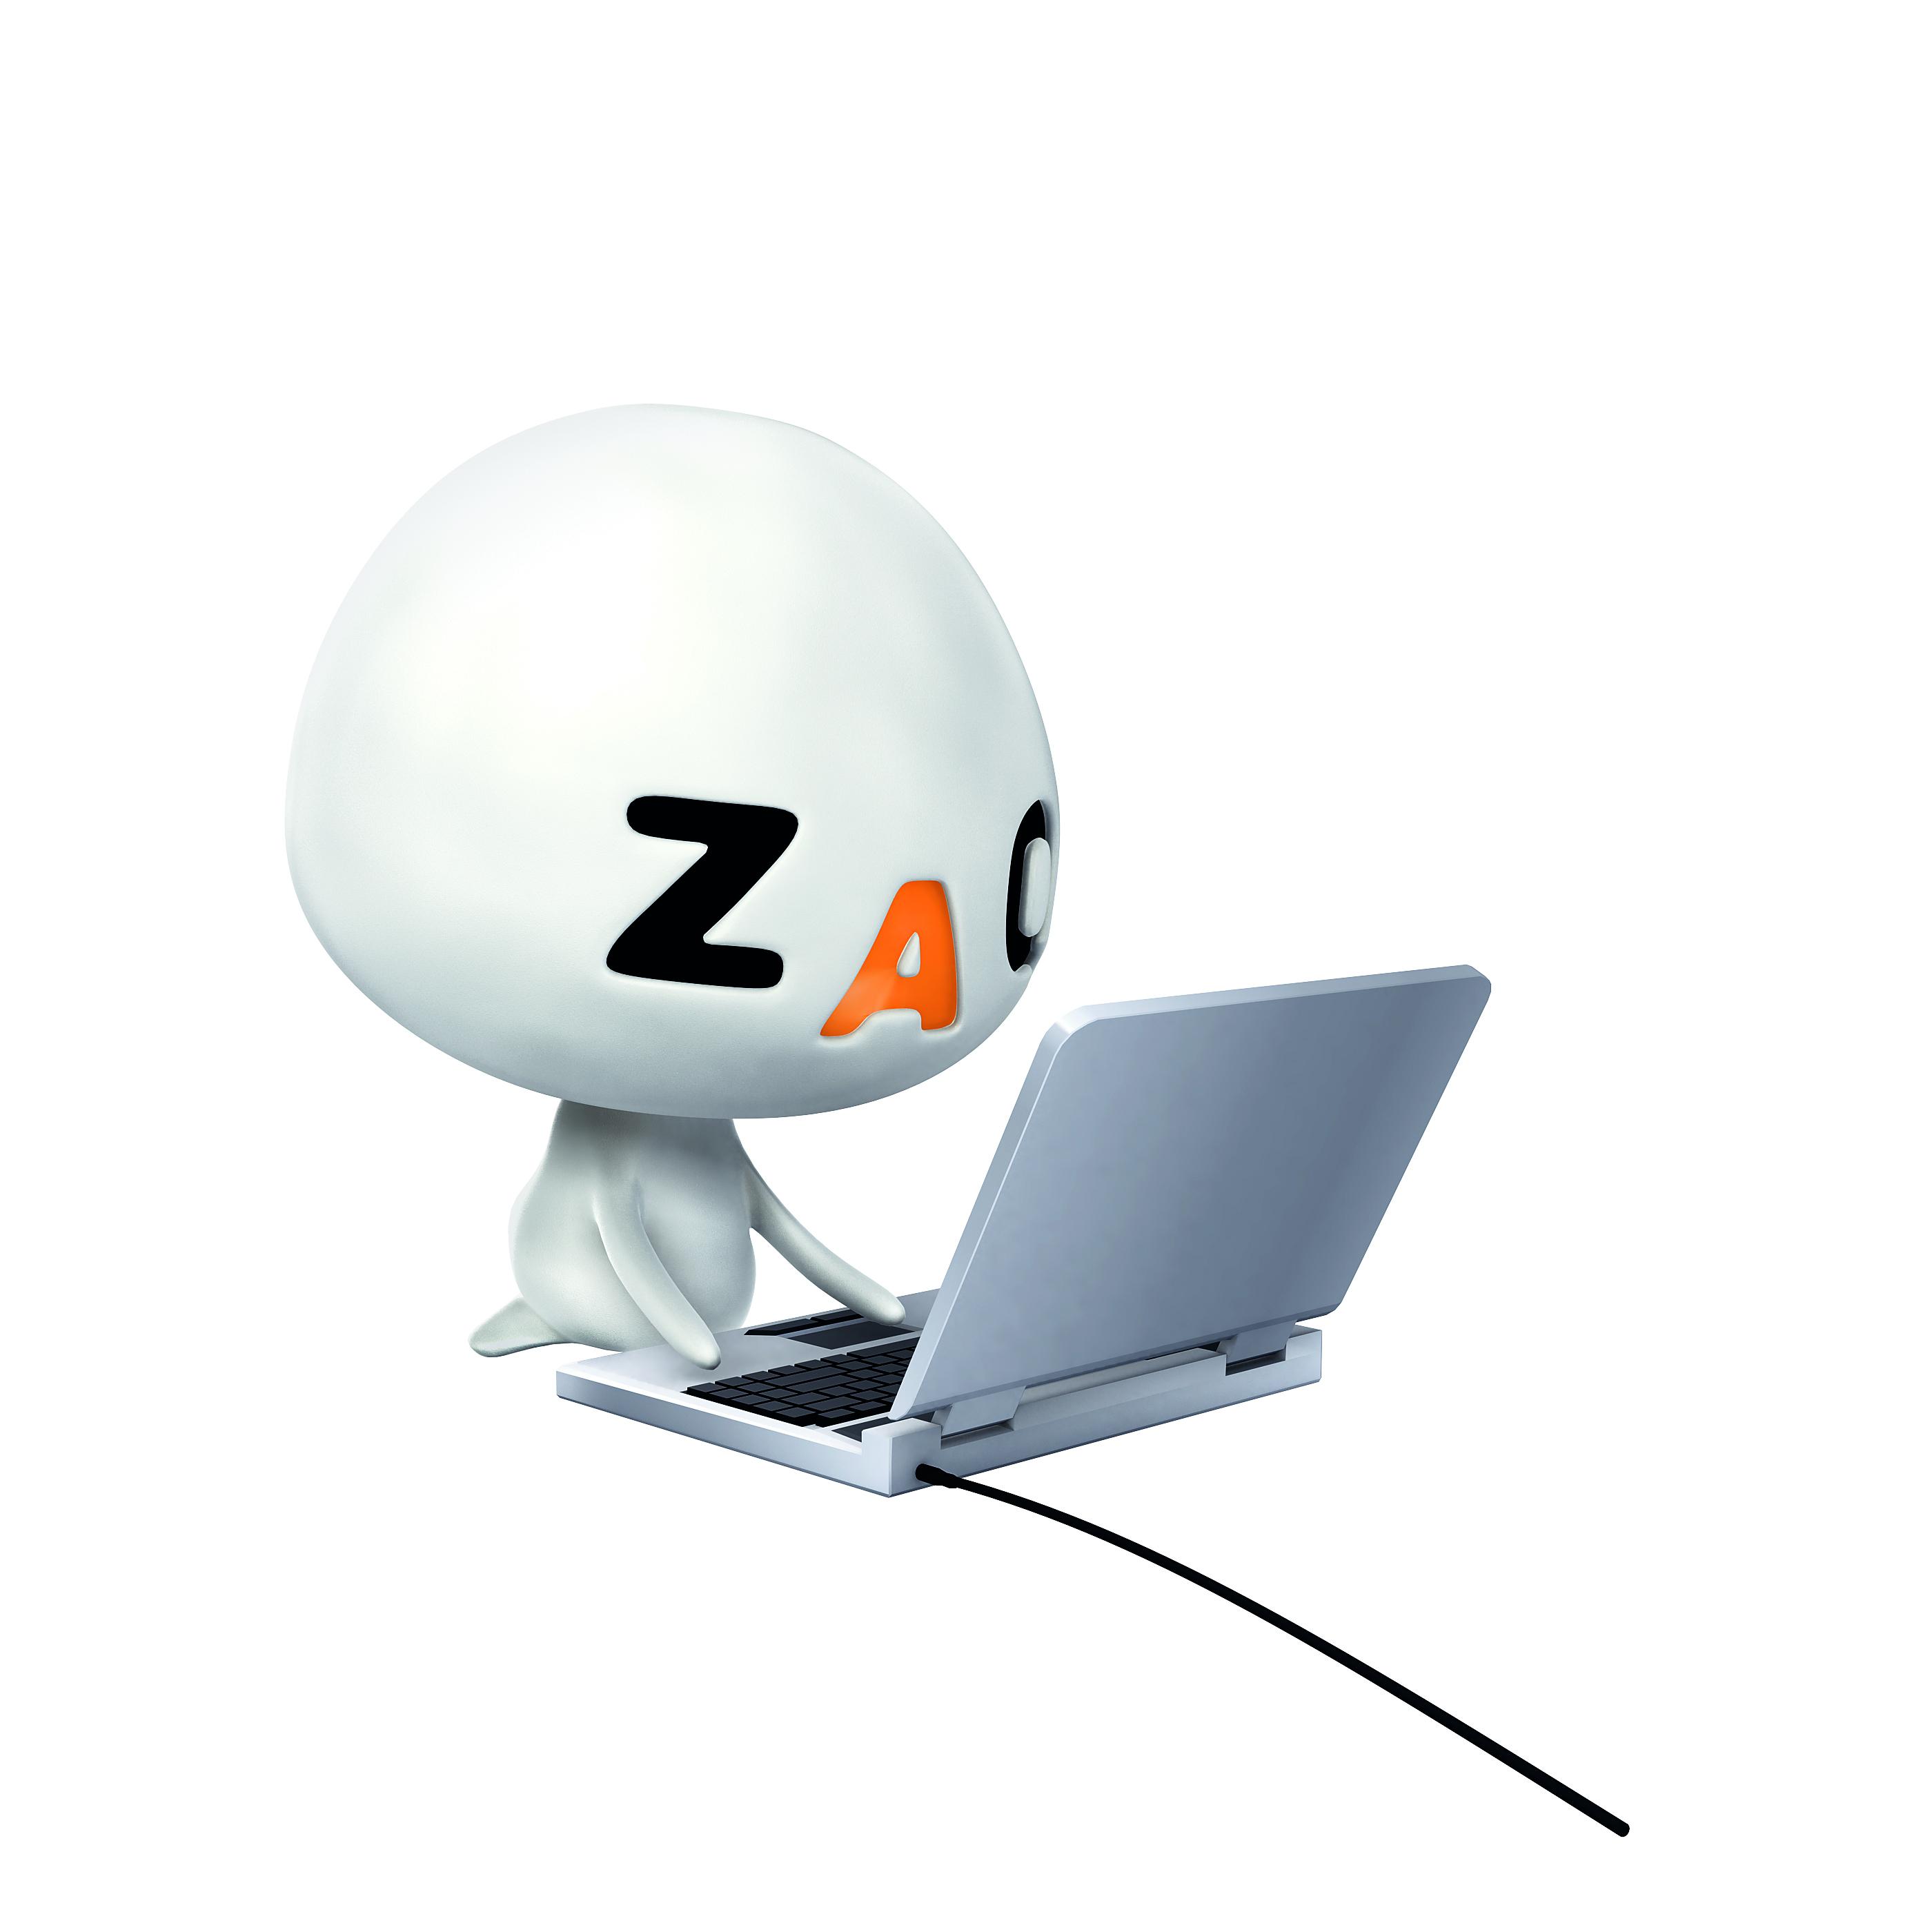 zaq_パソコン